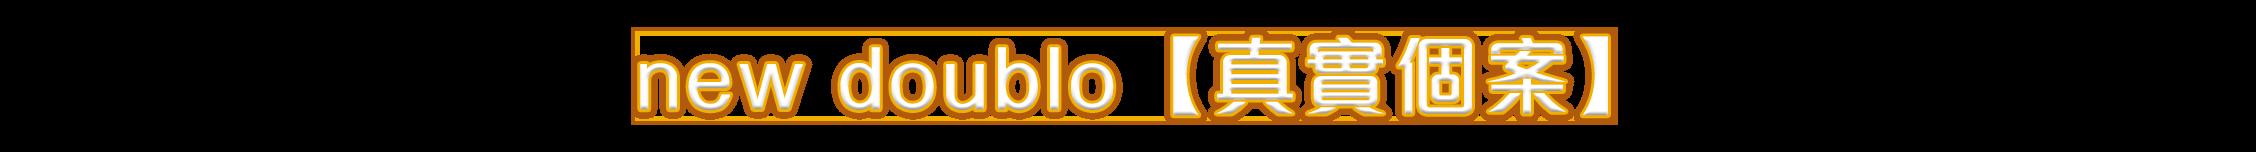 title6